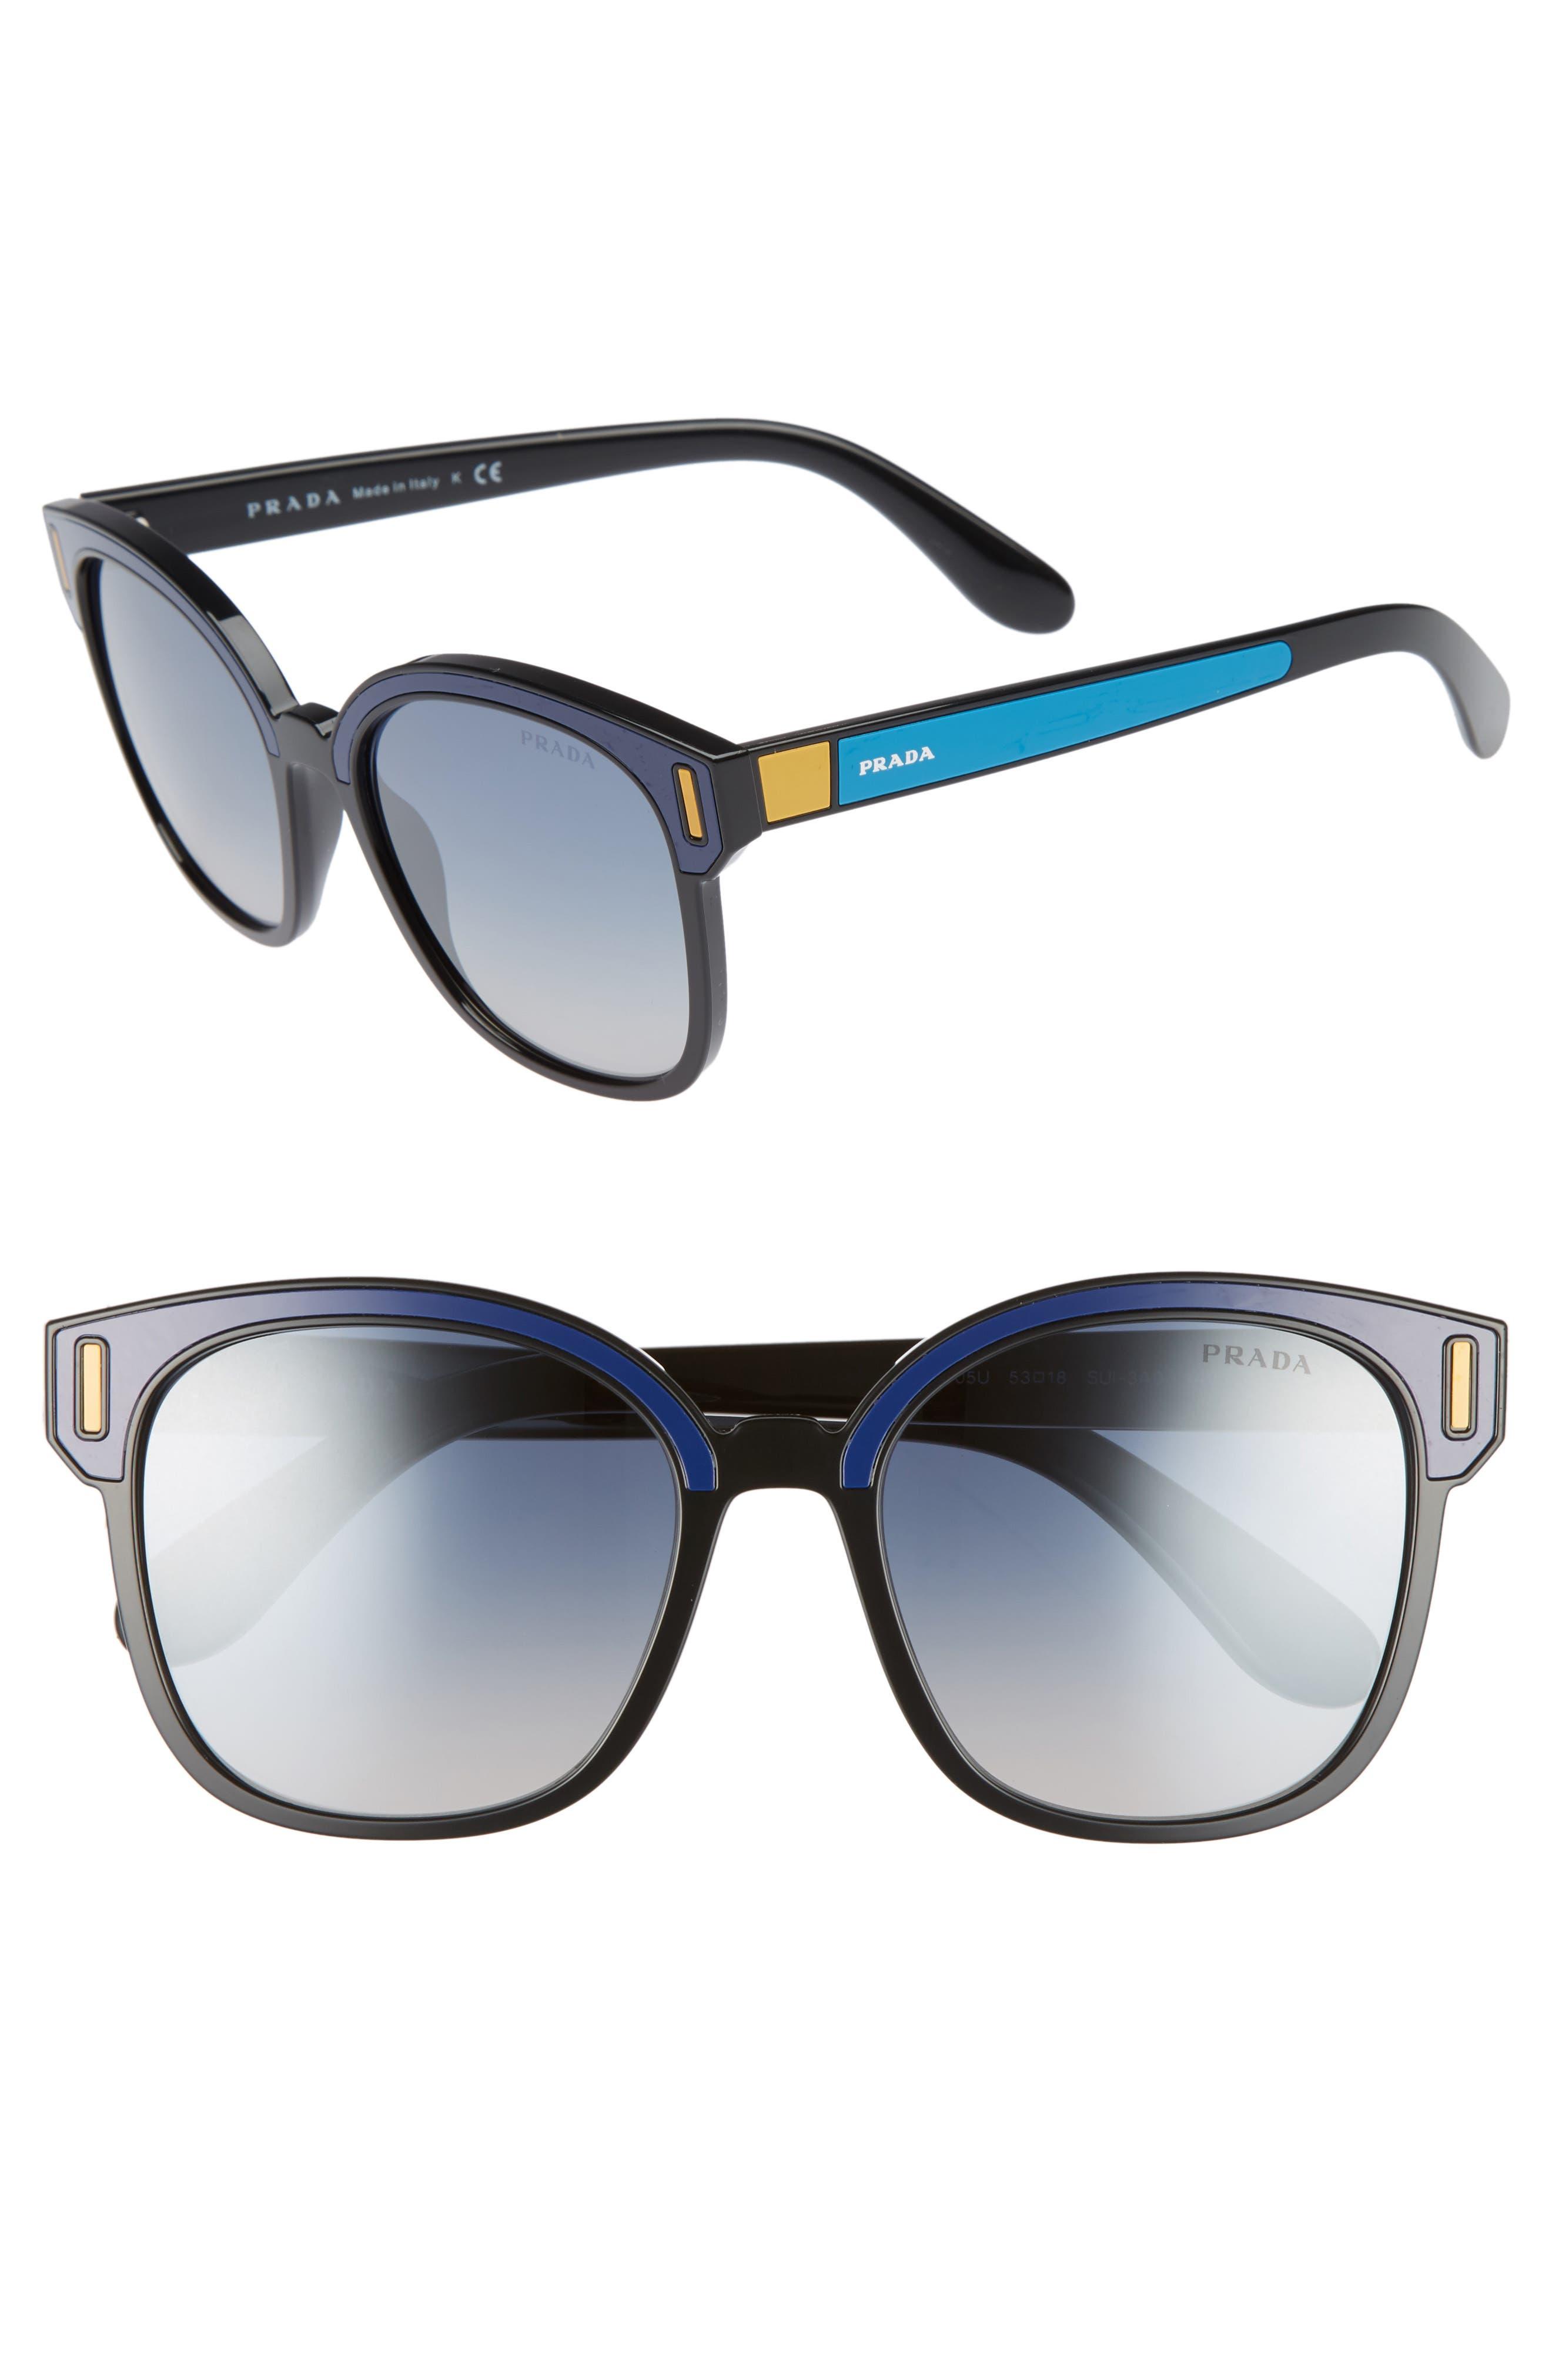 Main Image - Prada 53mm Sunglasses